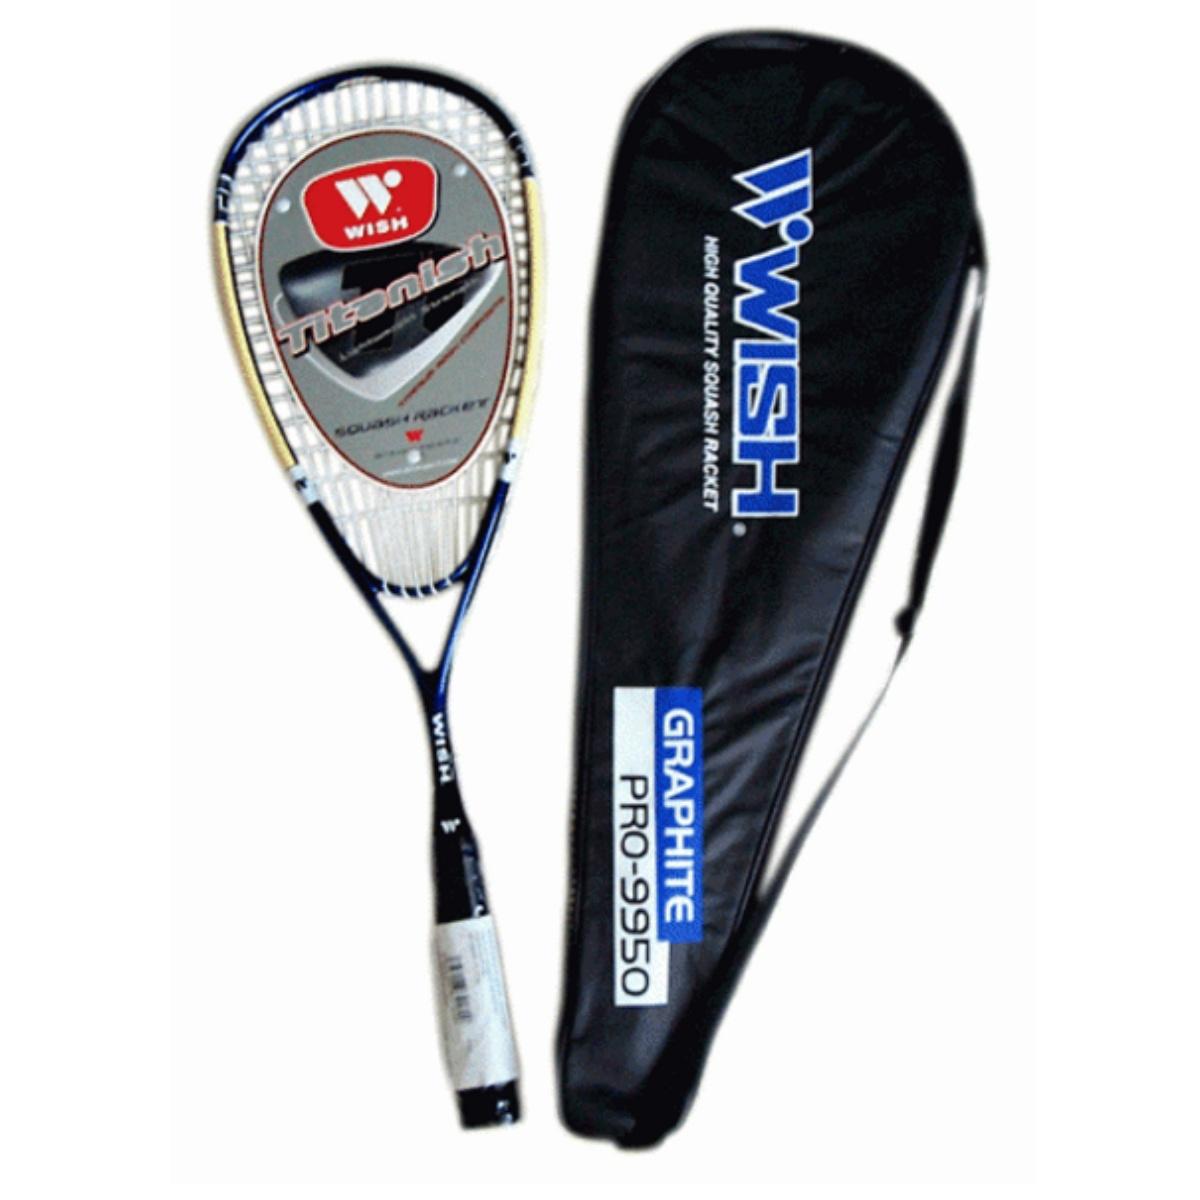 Squashová raketa WISH Graphit 9950